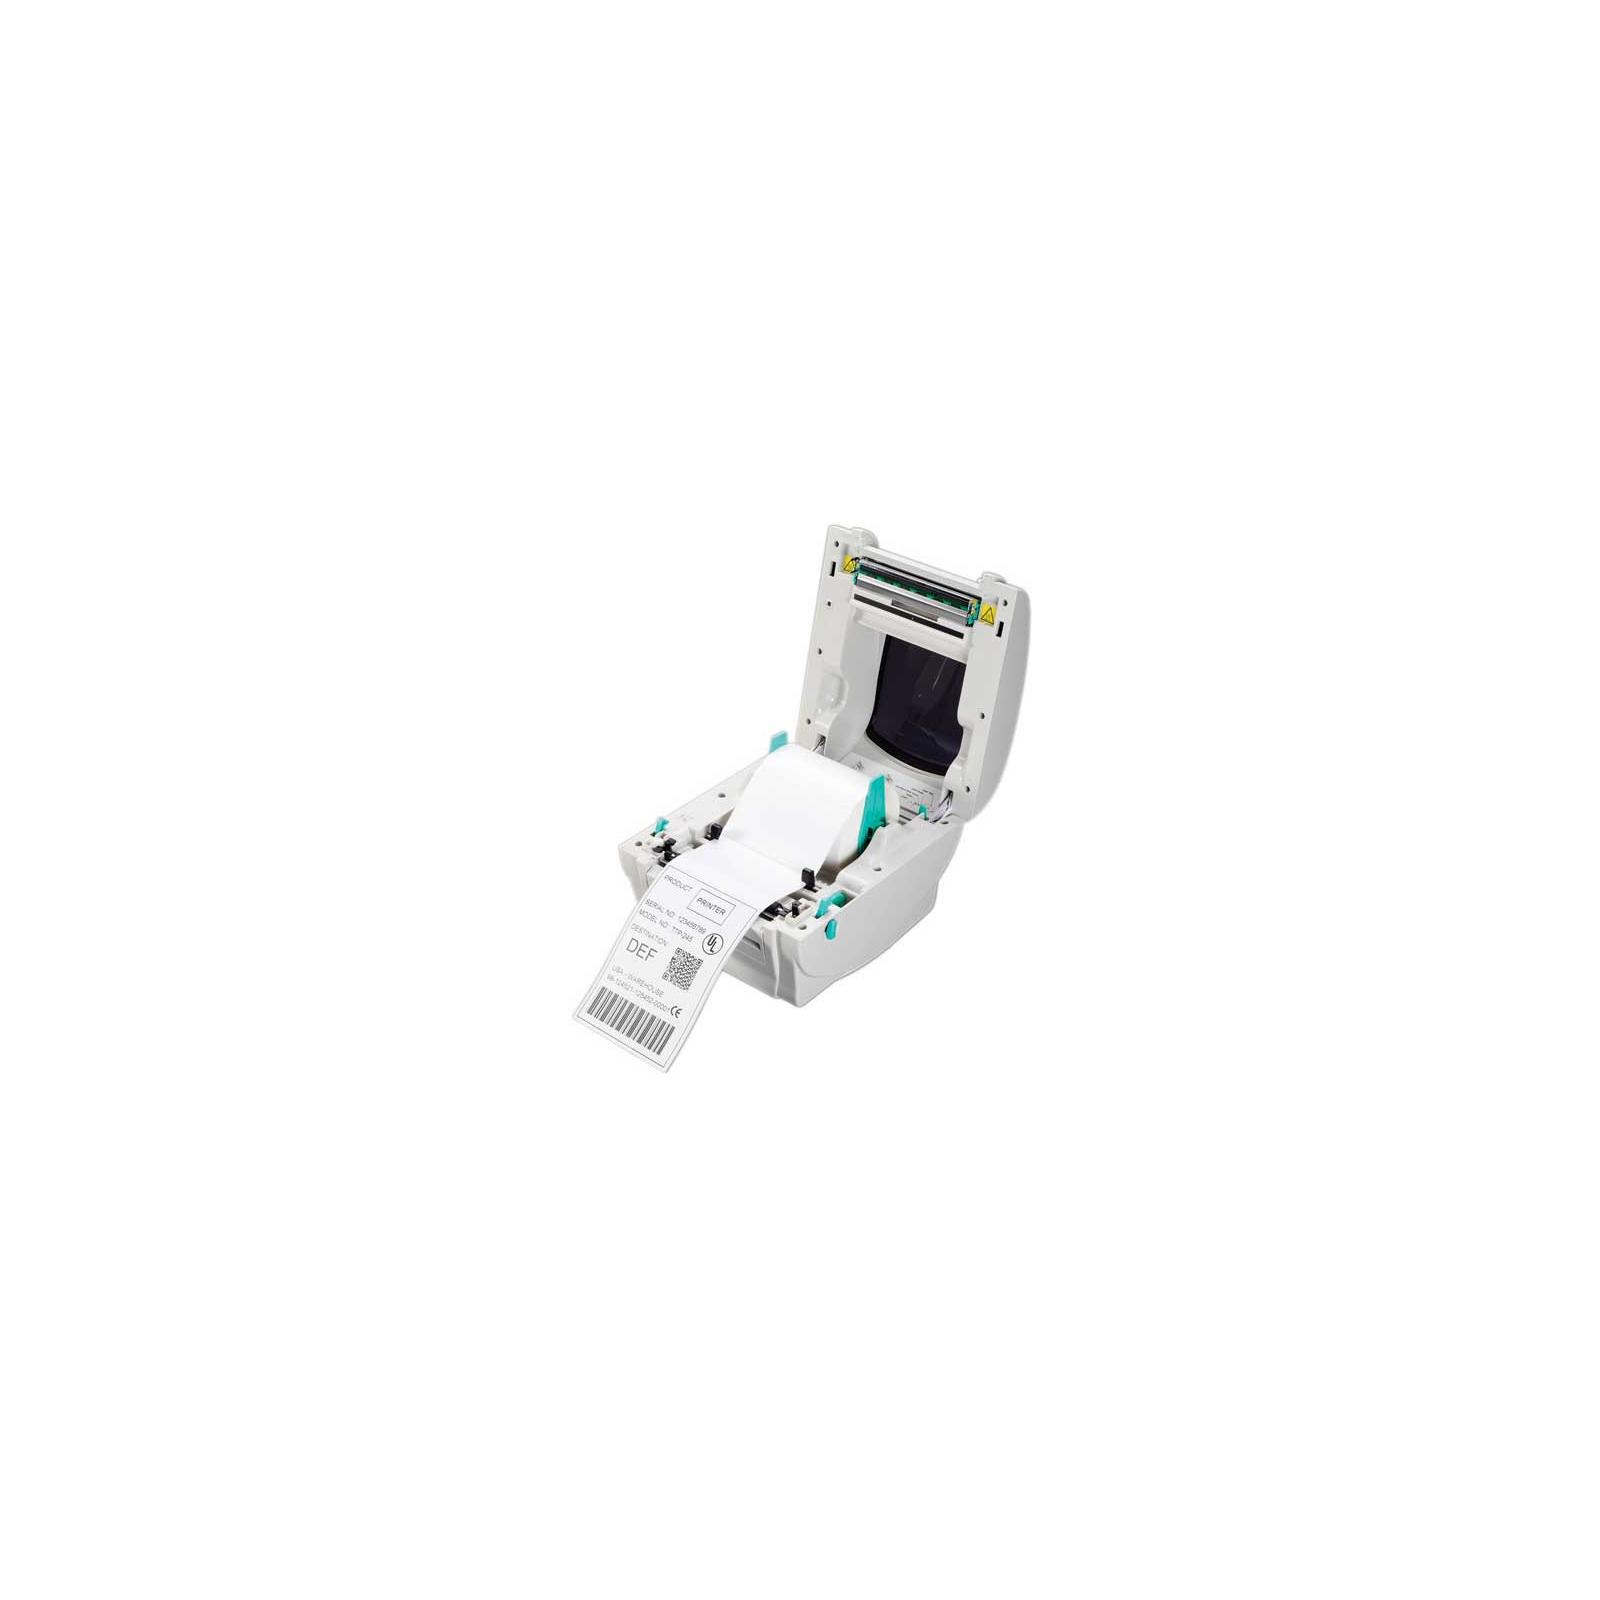 Принтер этикеток TSC TSC TDP-244 (4020000021) изображение 3